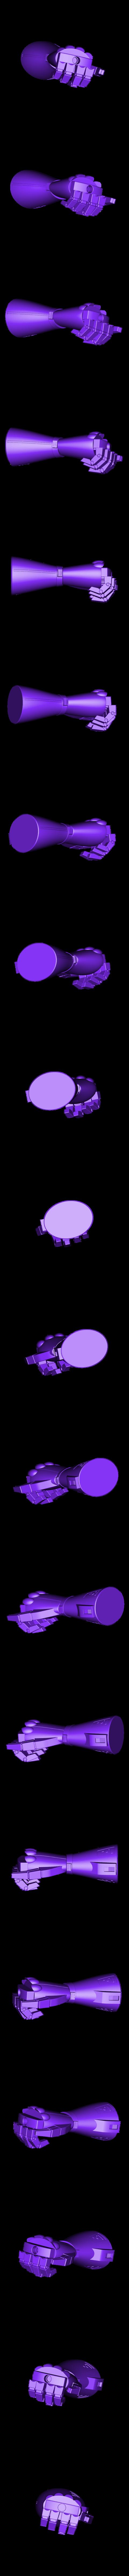 glove.stl Download STL file robocop hand with stand / mano de robocop con stand • 3D printer design, MLBdesign